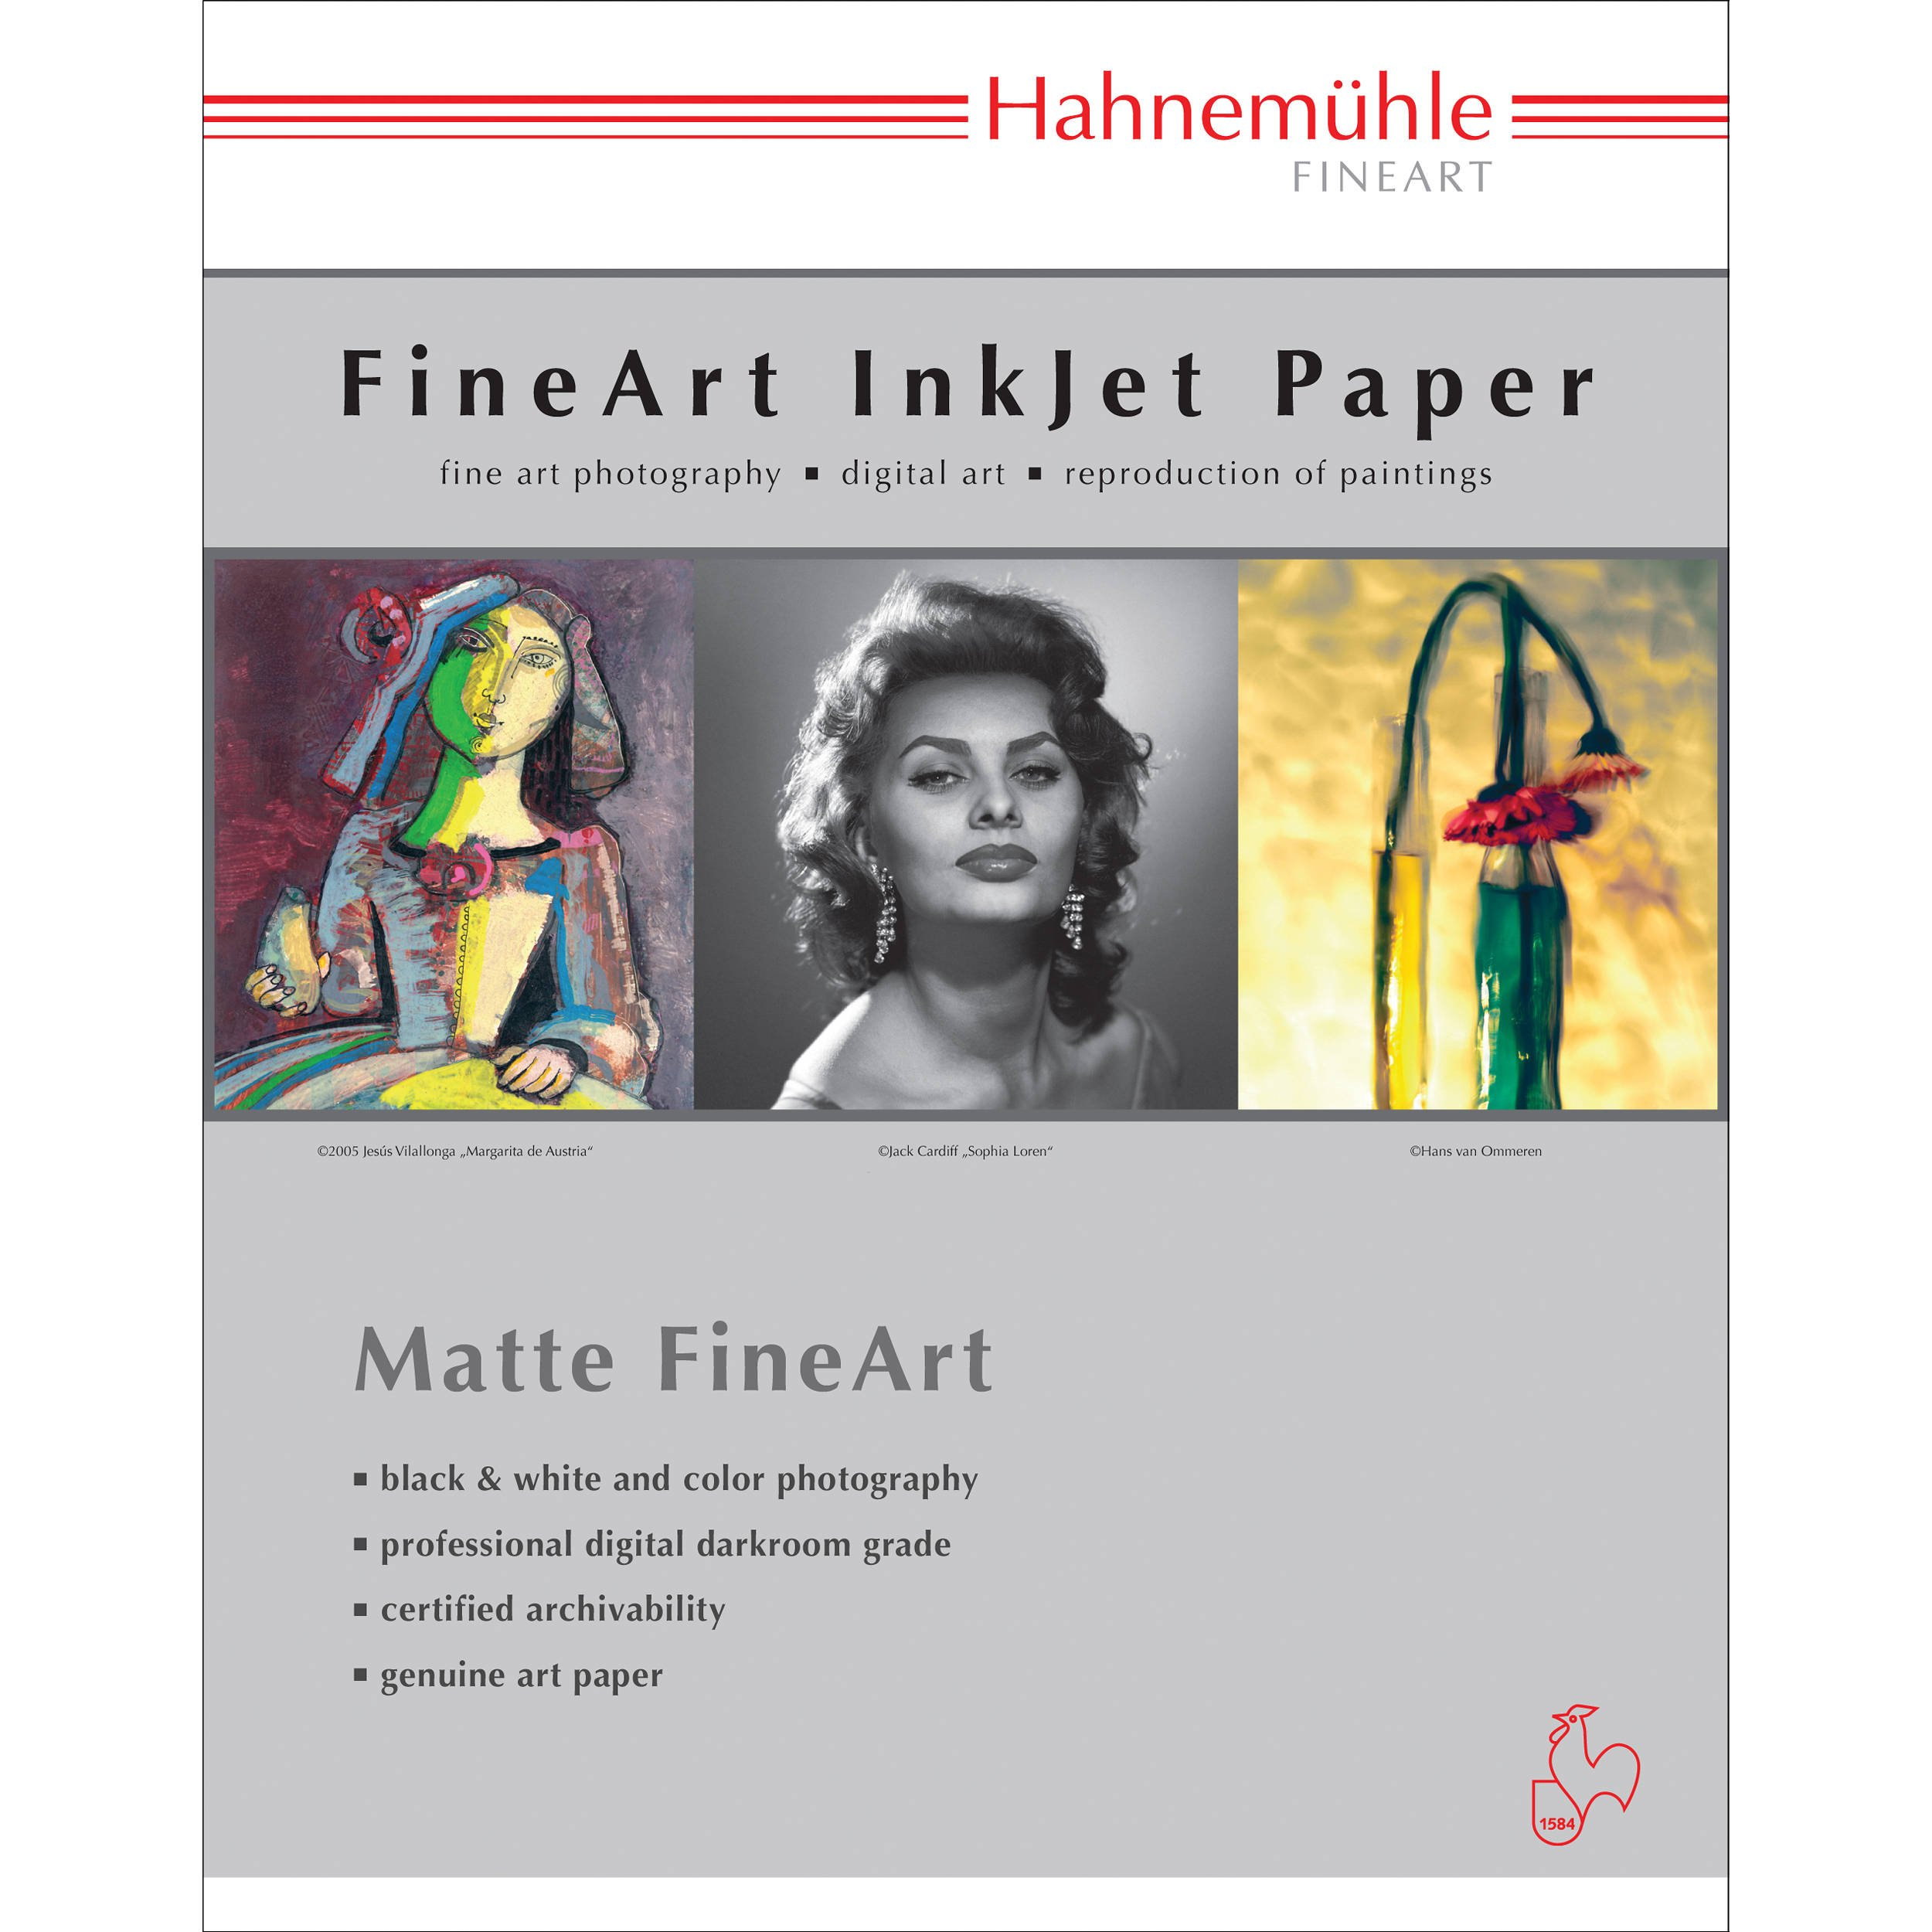 Hahnemuhle 11 x 17 Photo Rag Paper (25 Sheets)